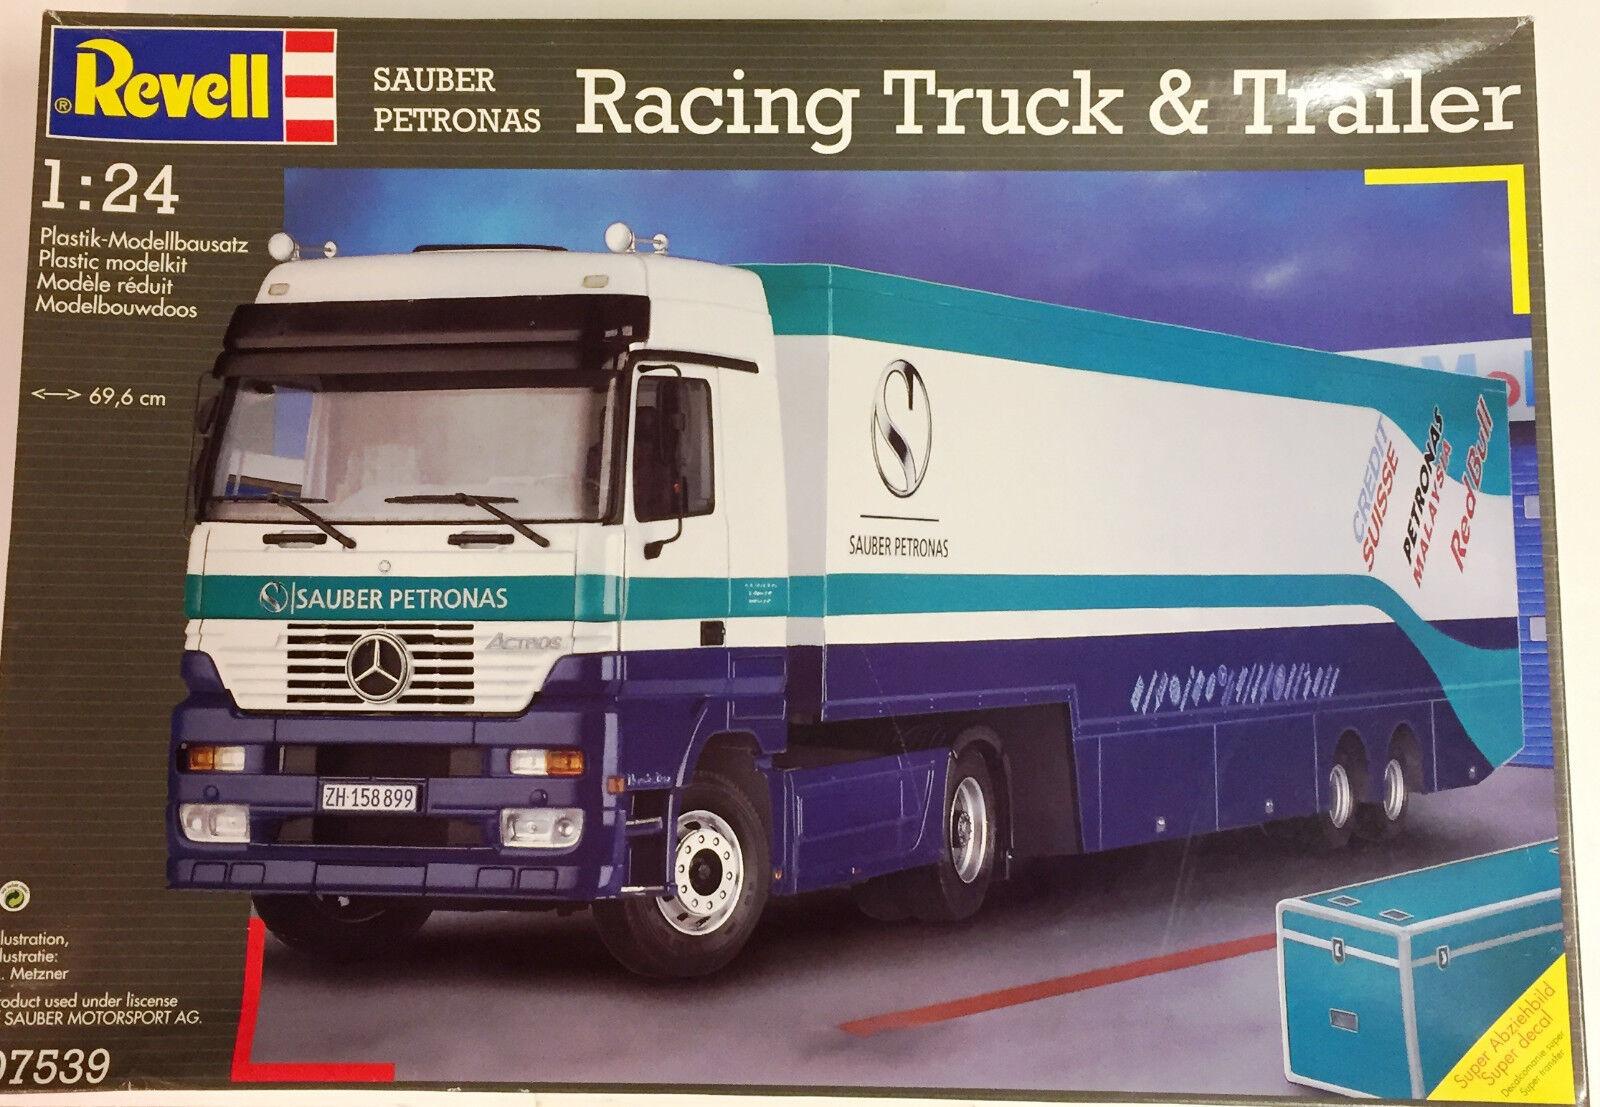 Revel Geruomoia 1 24 Sauber Petronas Racing Truck